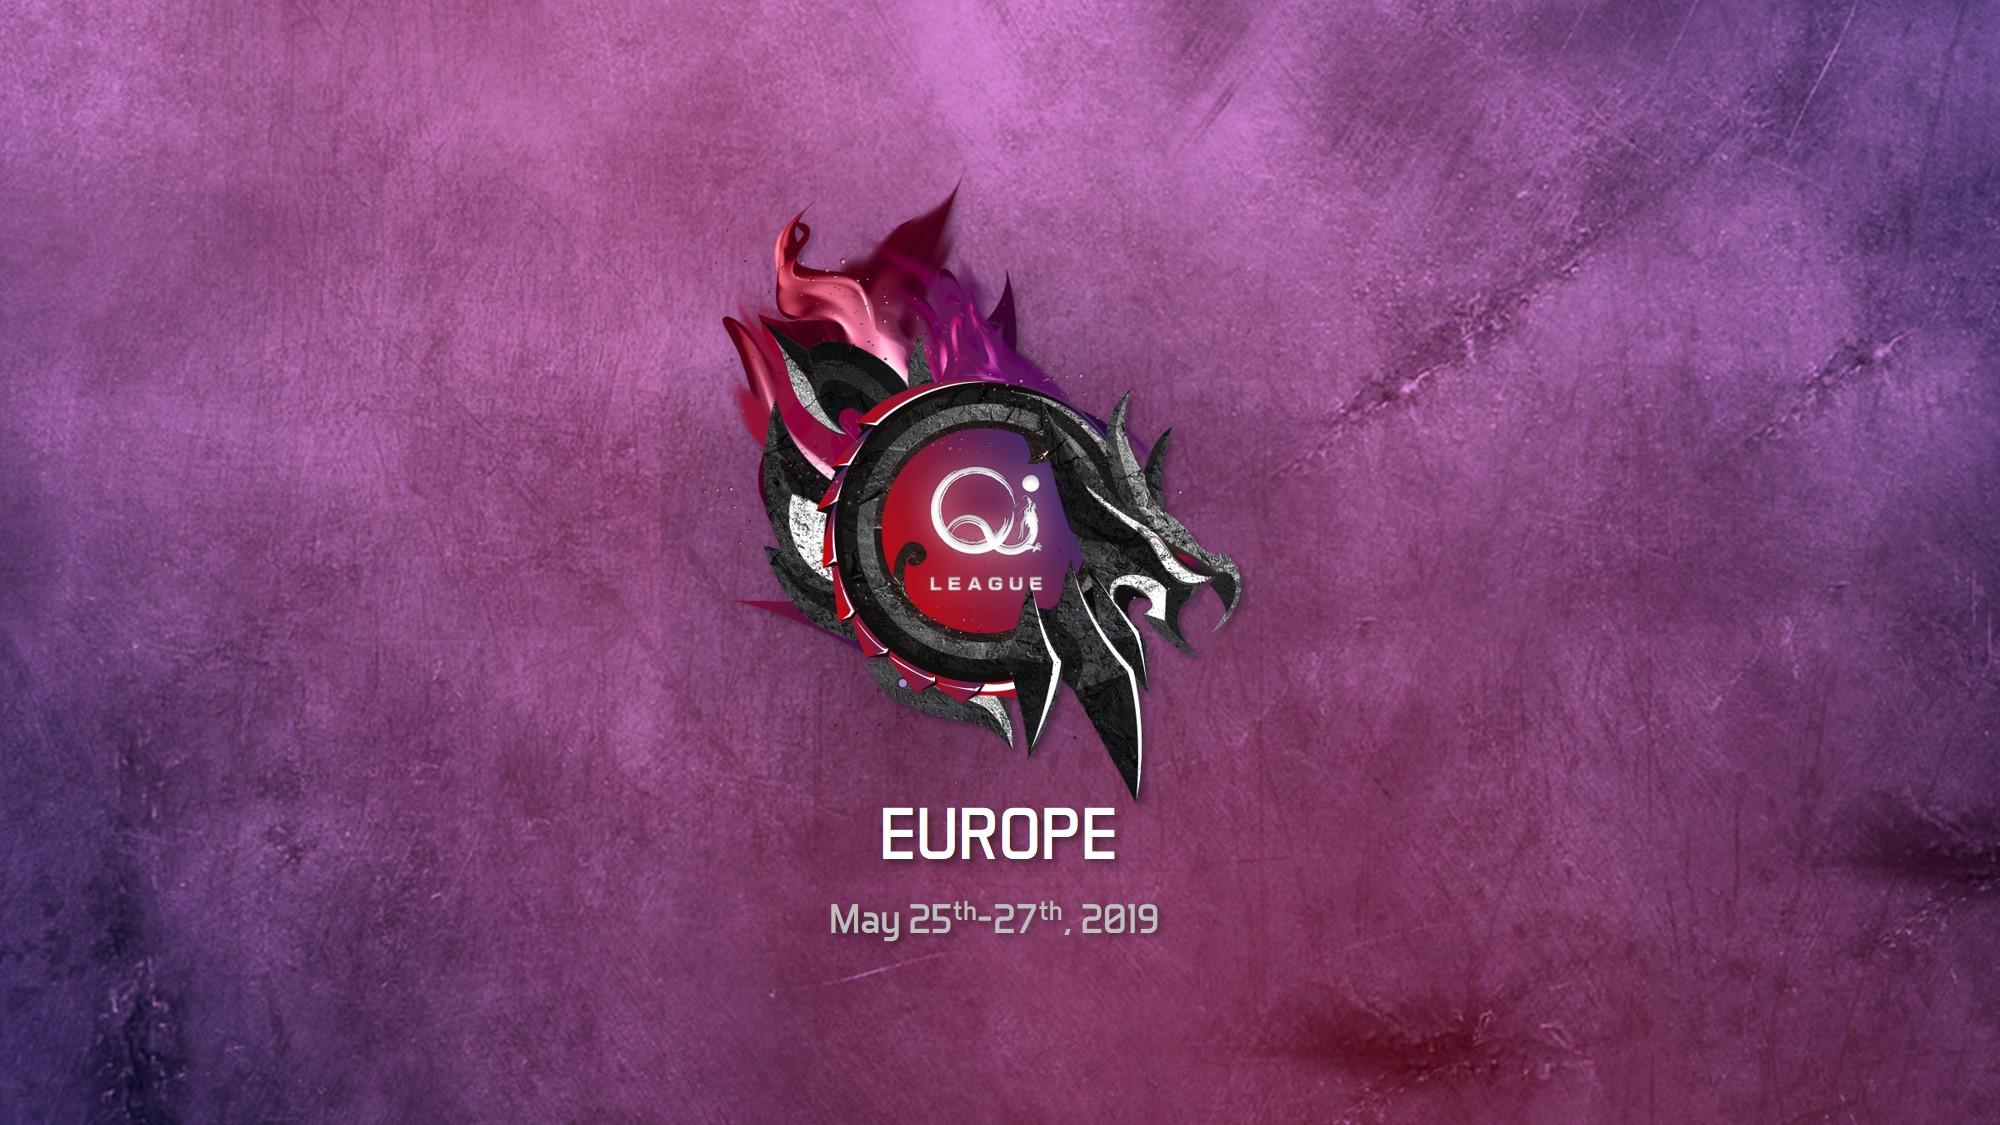 Qi邀请赛欧洲区25日开打,Major队伍The Final Tribe将参赛!